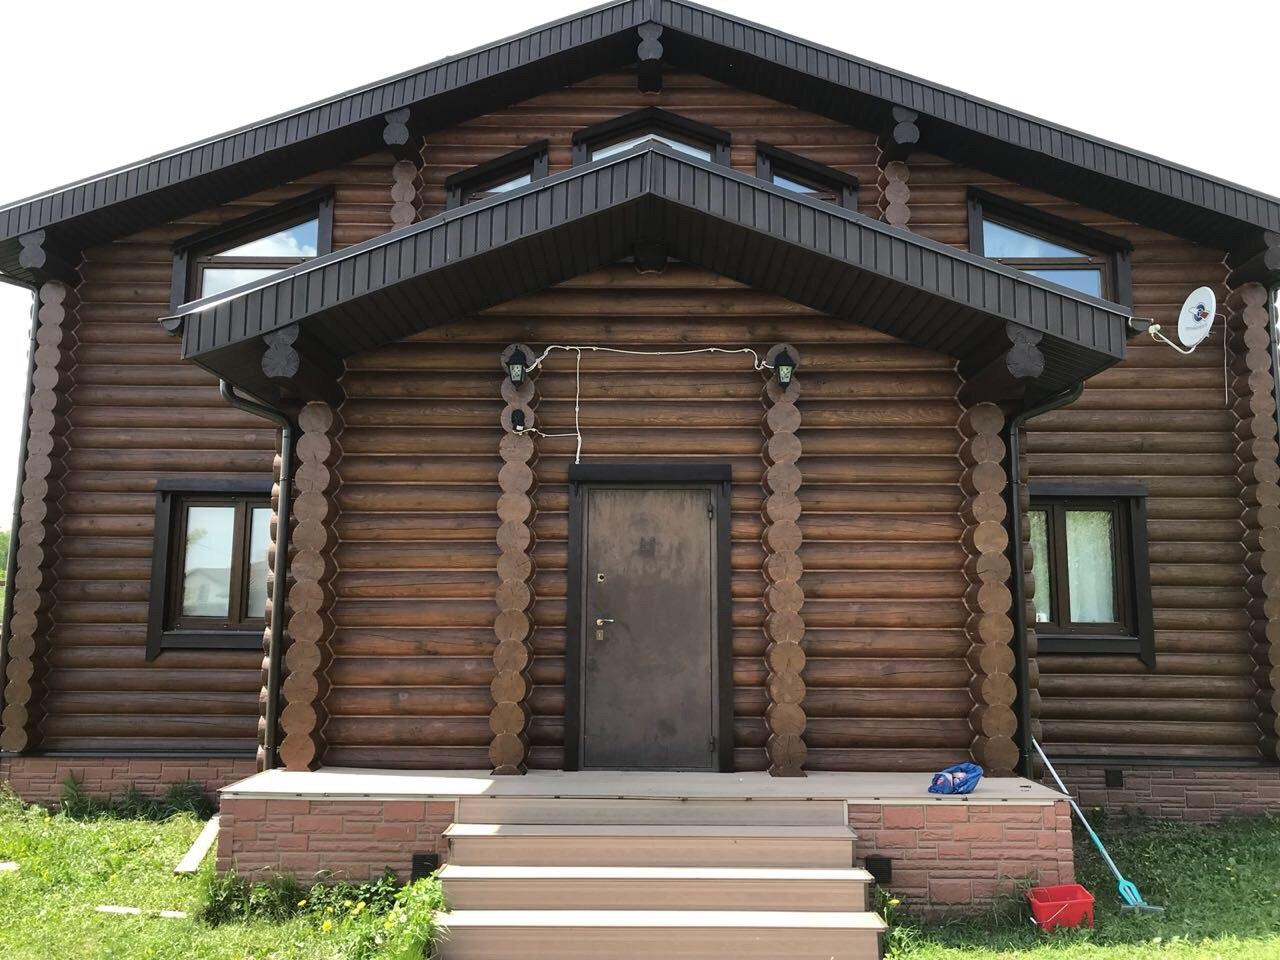 кыргызстане дом цвета палисандр фото один дней, уна